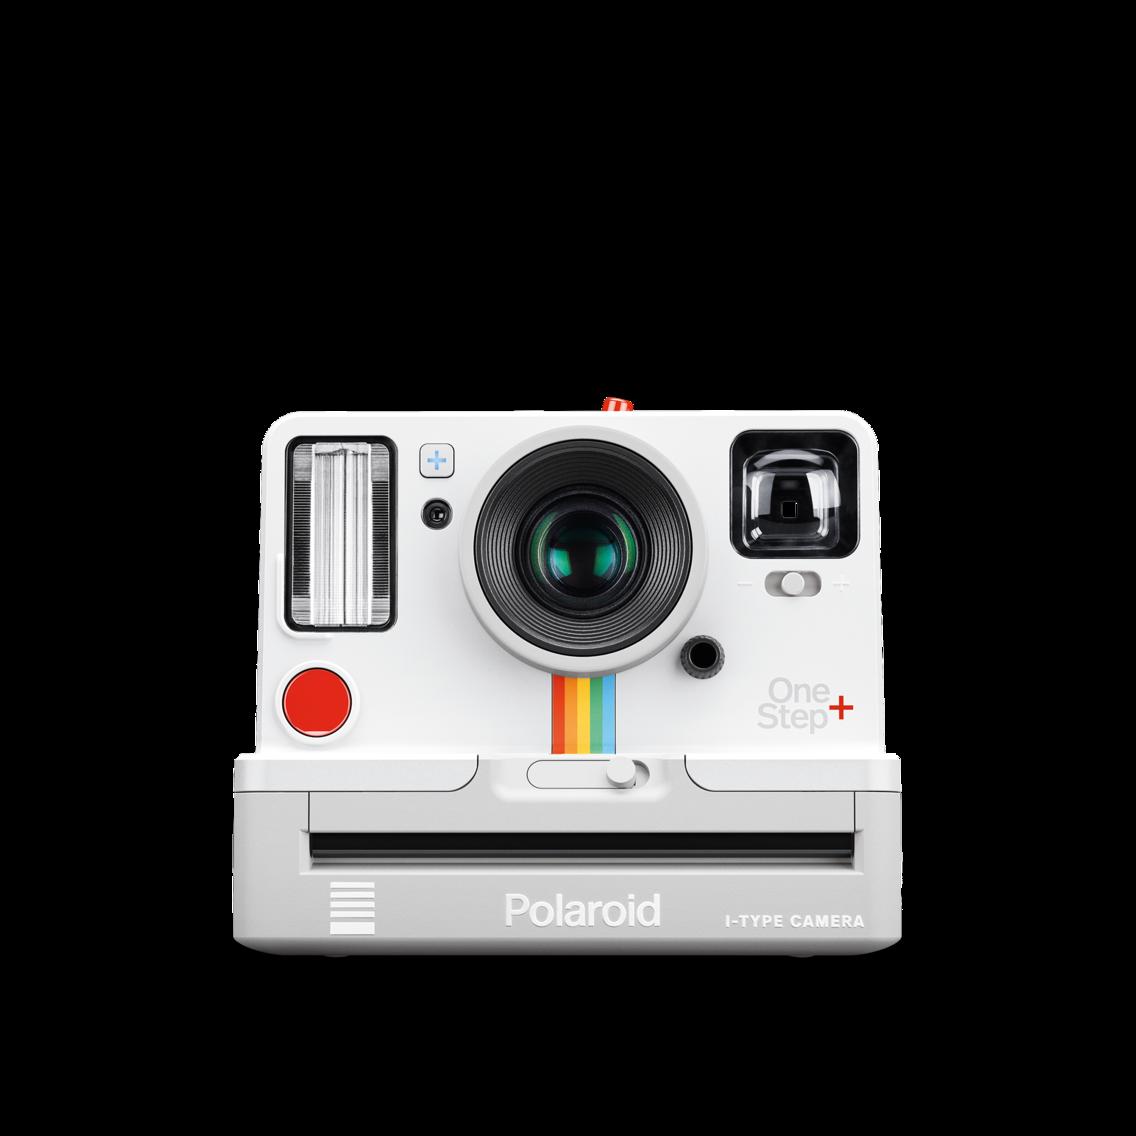 Polaroid Onestep I Type Instant Camera Instant Camera Vintage Polaroid Camera Cute Camera